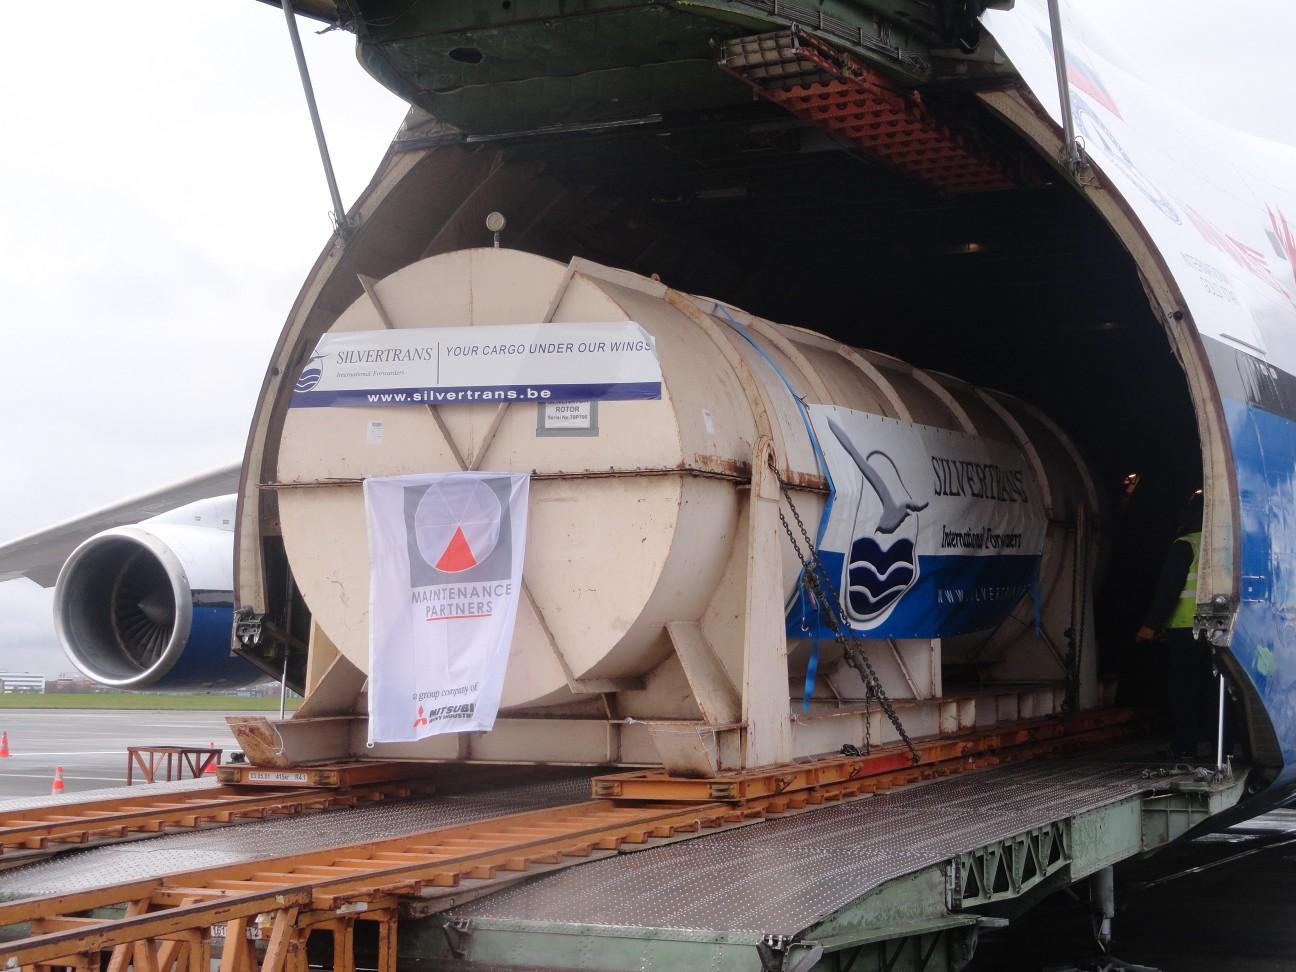 antonov-turbogenerator-maintenance-partners-037